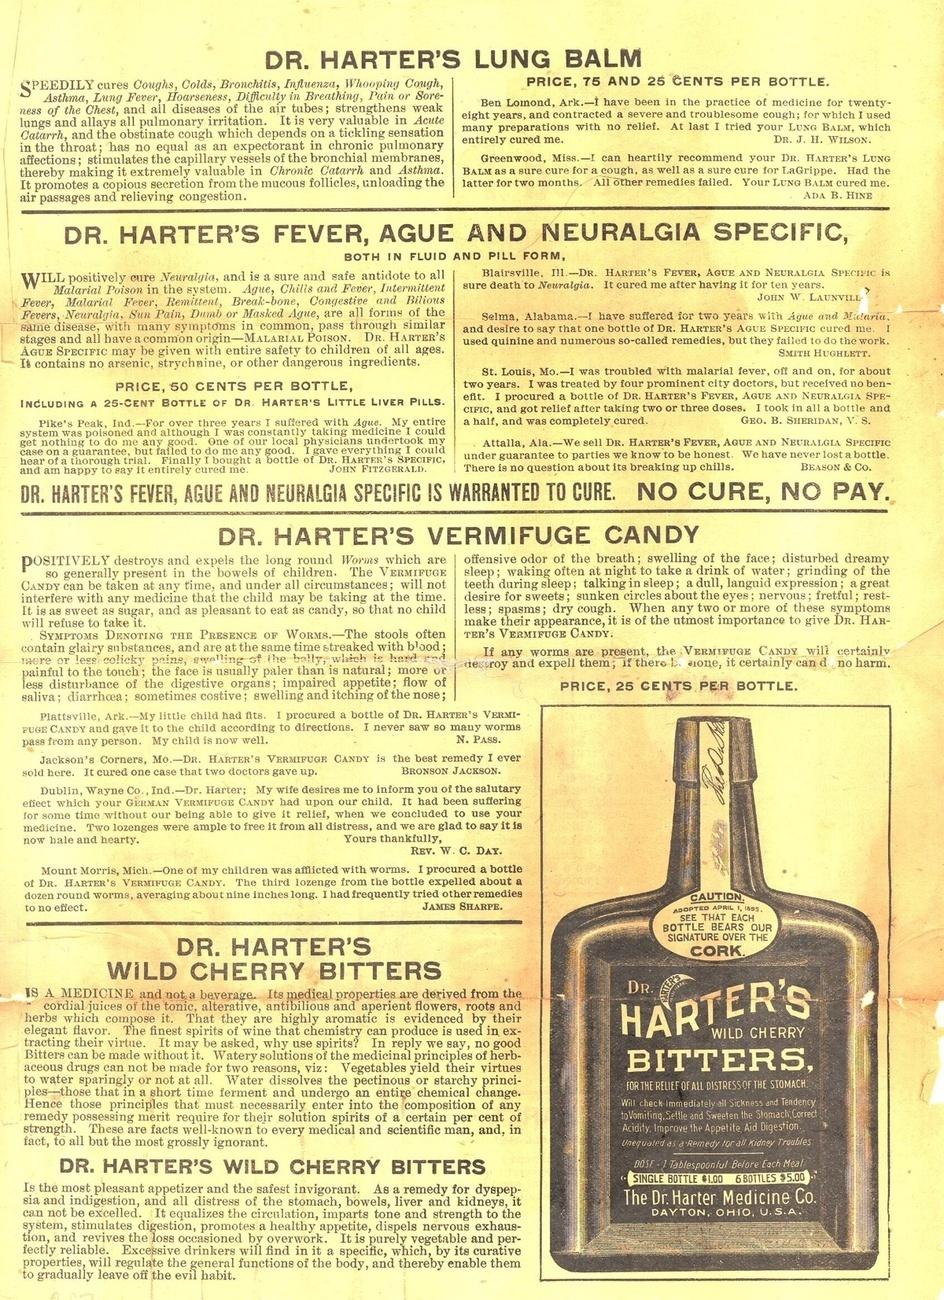 Dr Harter's bitters advertising sheet 1860 patent medicine antique ephemera